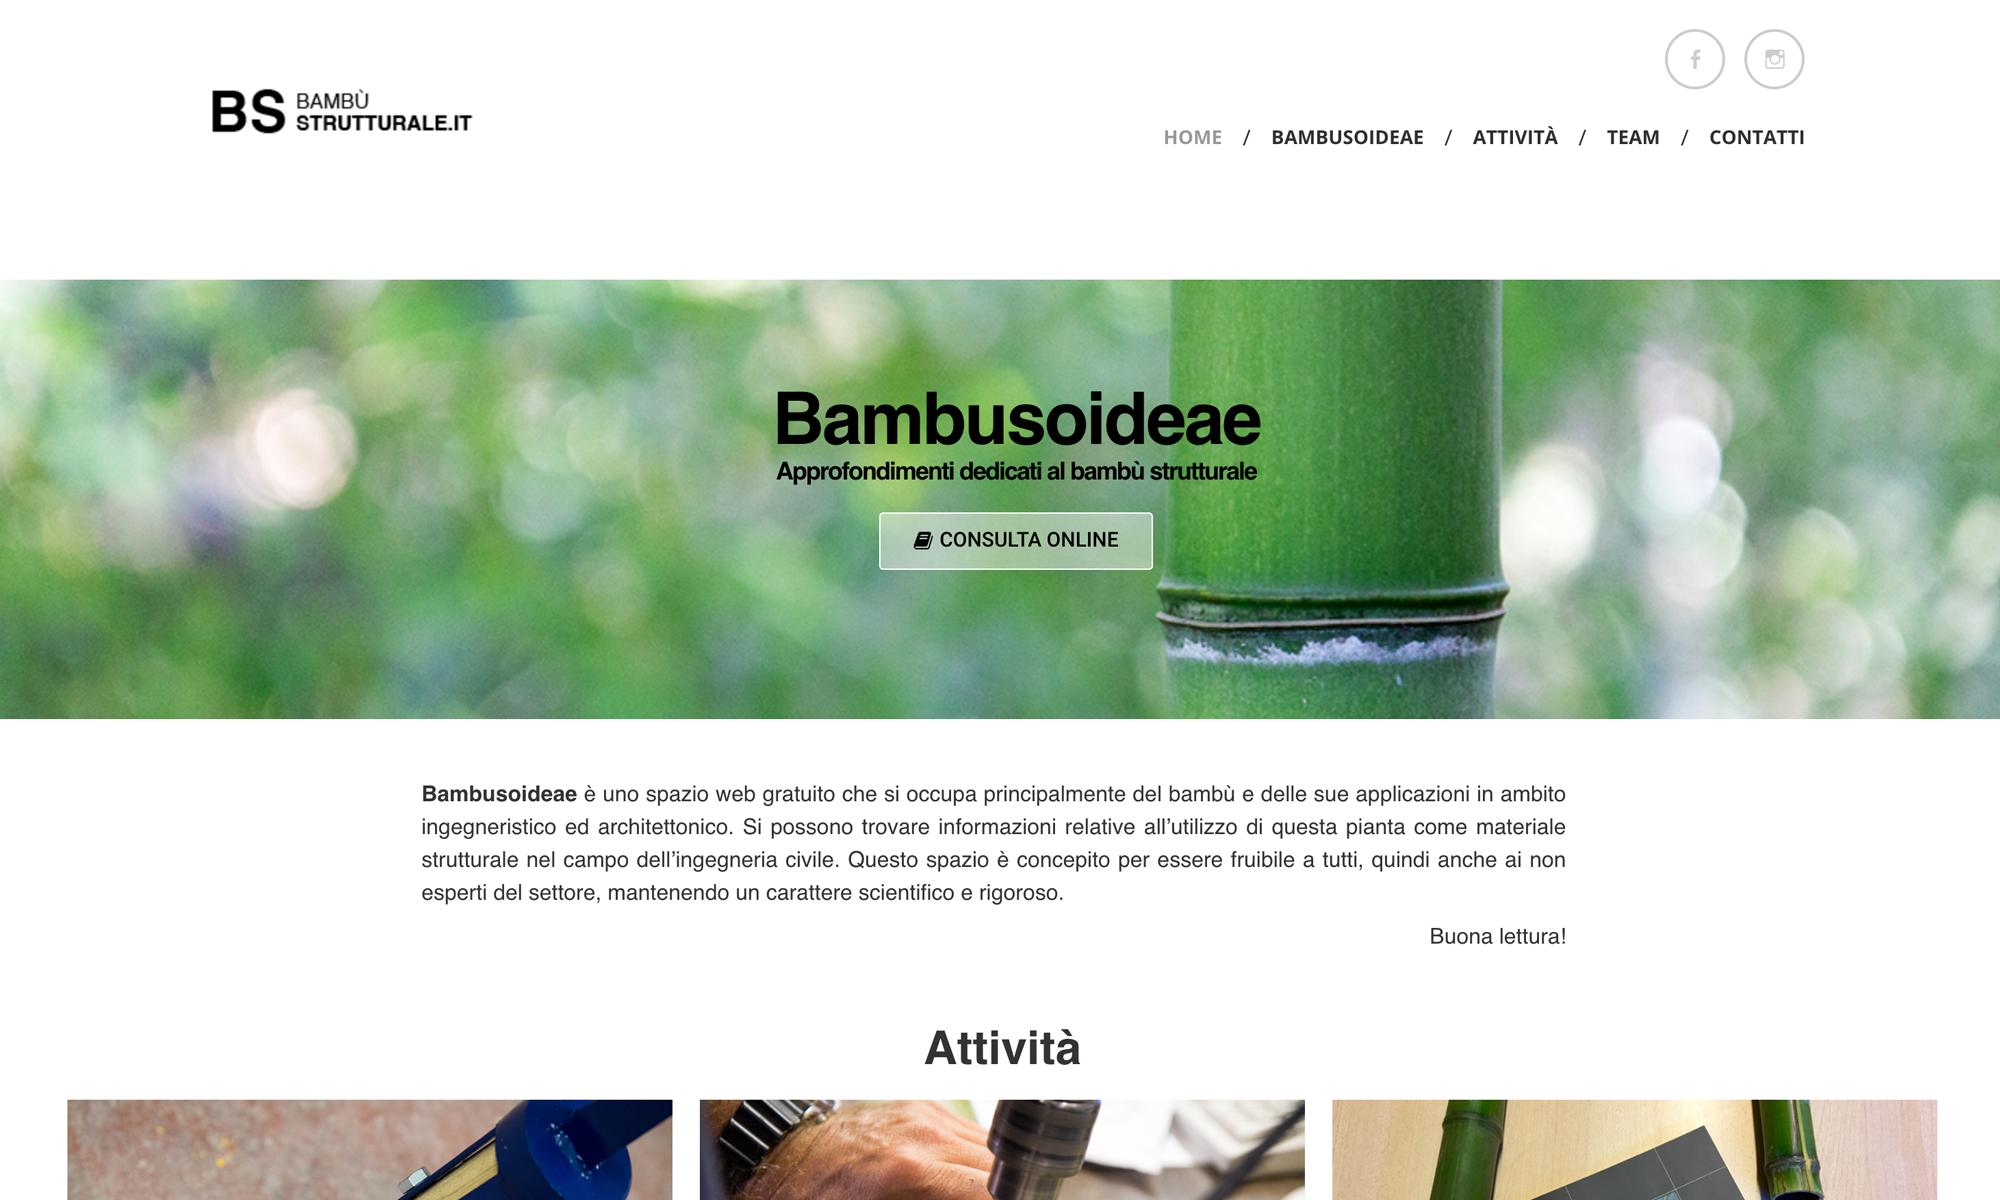 Web site design Bambù Strutturale